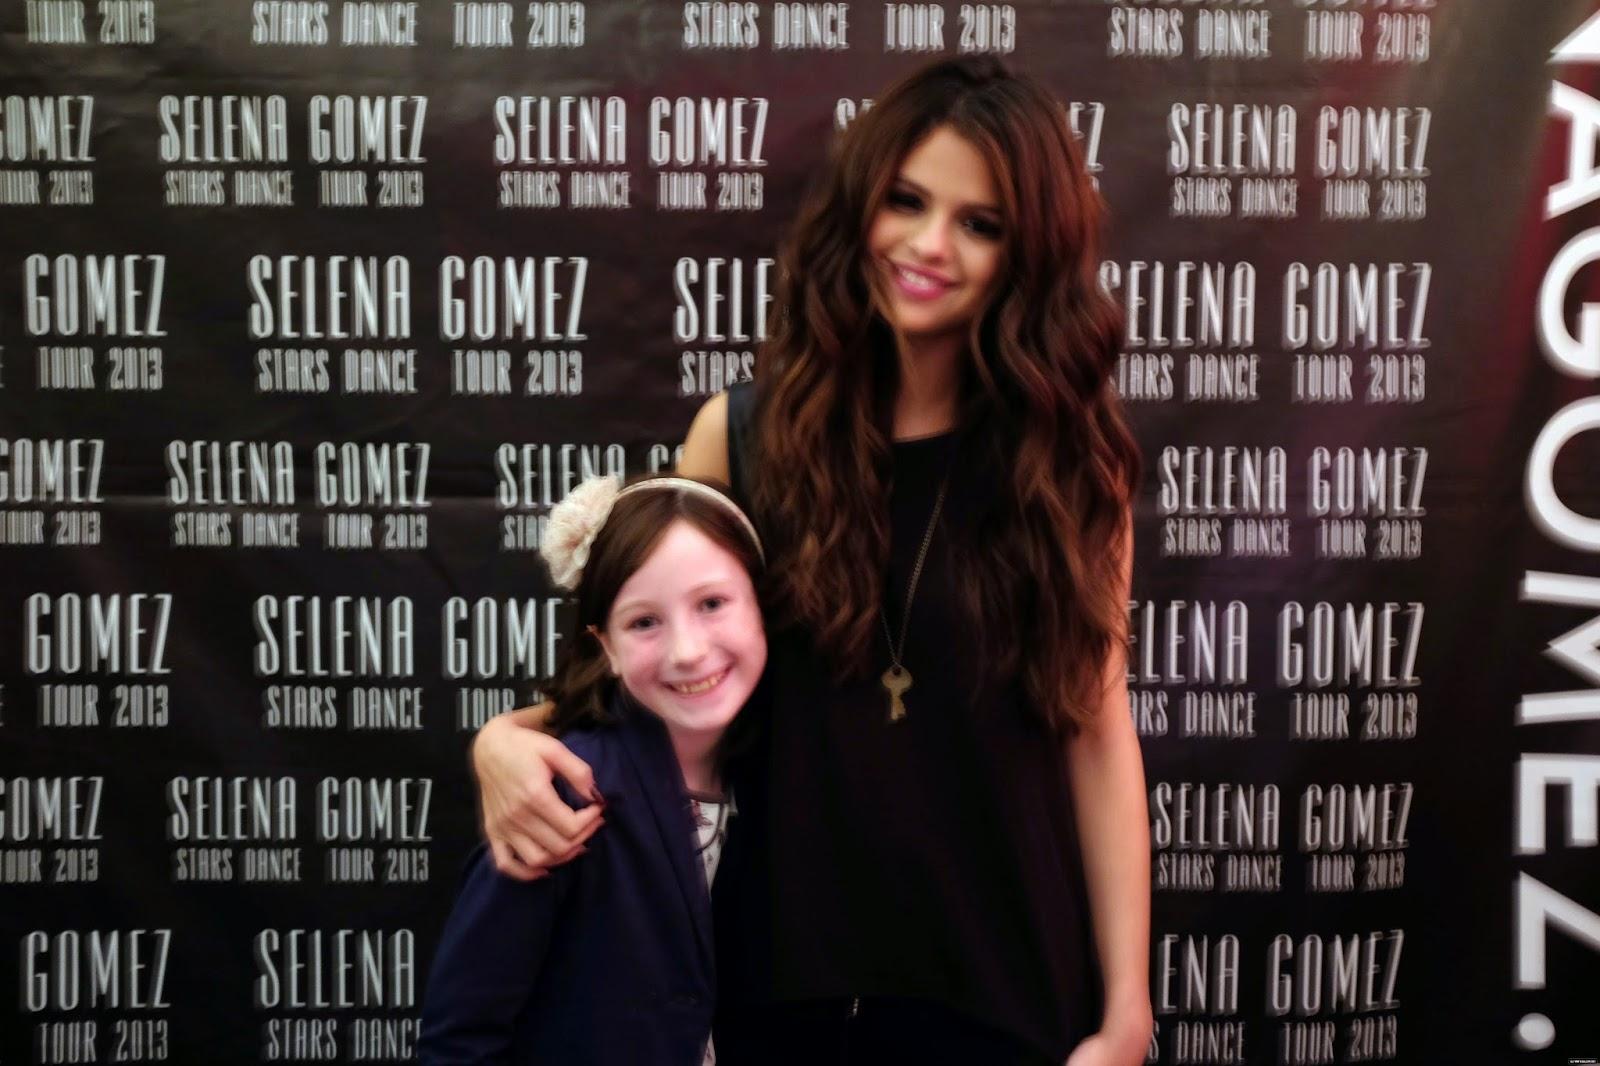 Selena gomez style stars dance world tour meet greet london stars dance world tour meet greet london england sep 7 2013 m4hsunfo